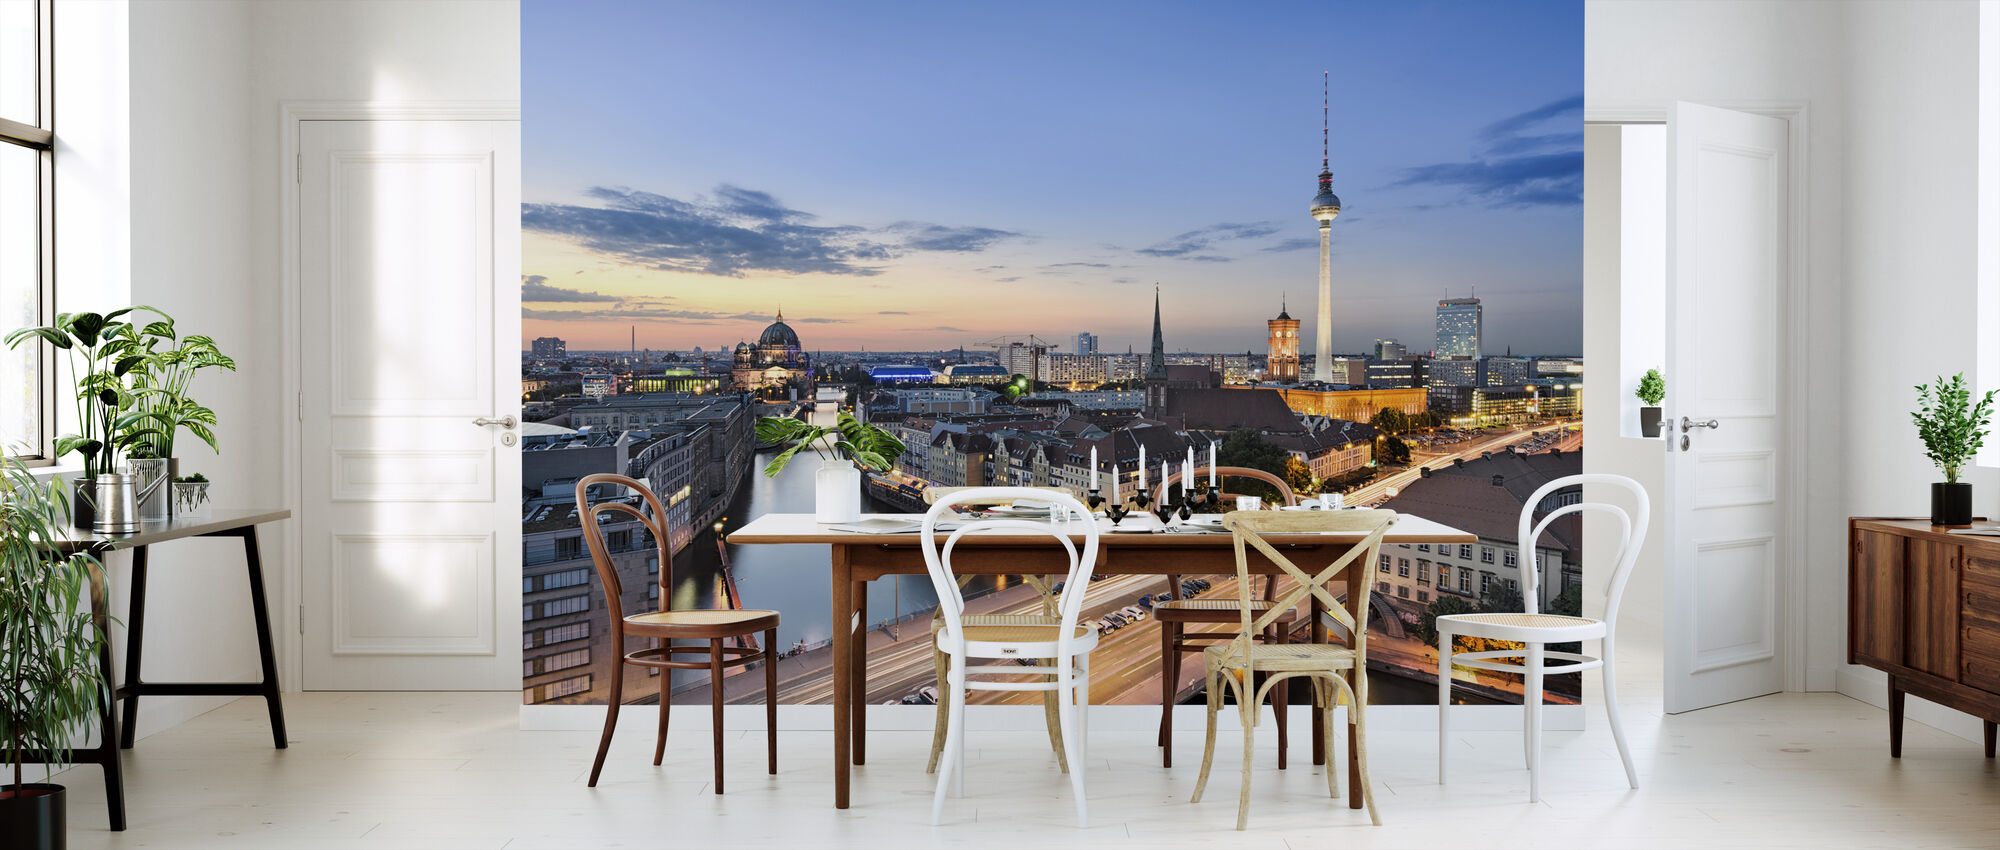 Berlin Skyline Panorama - Wallpaper - Kitchen